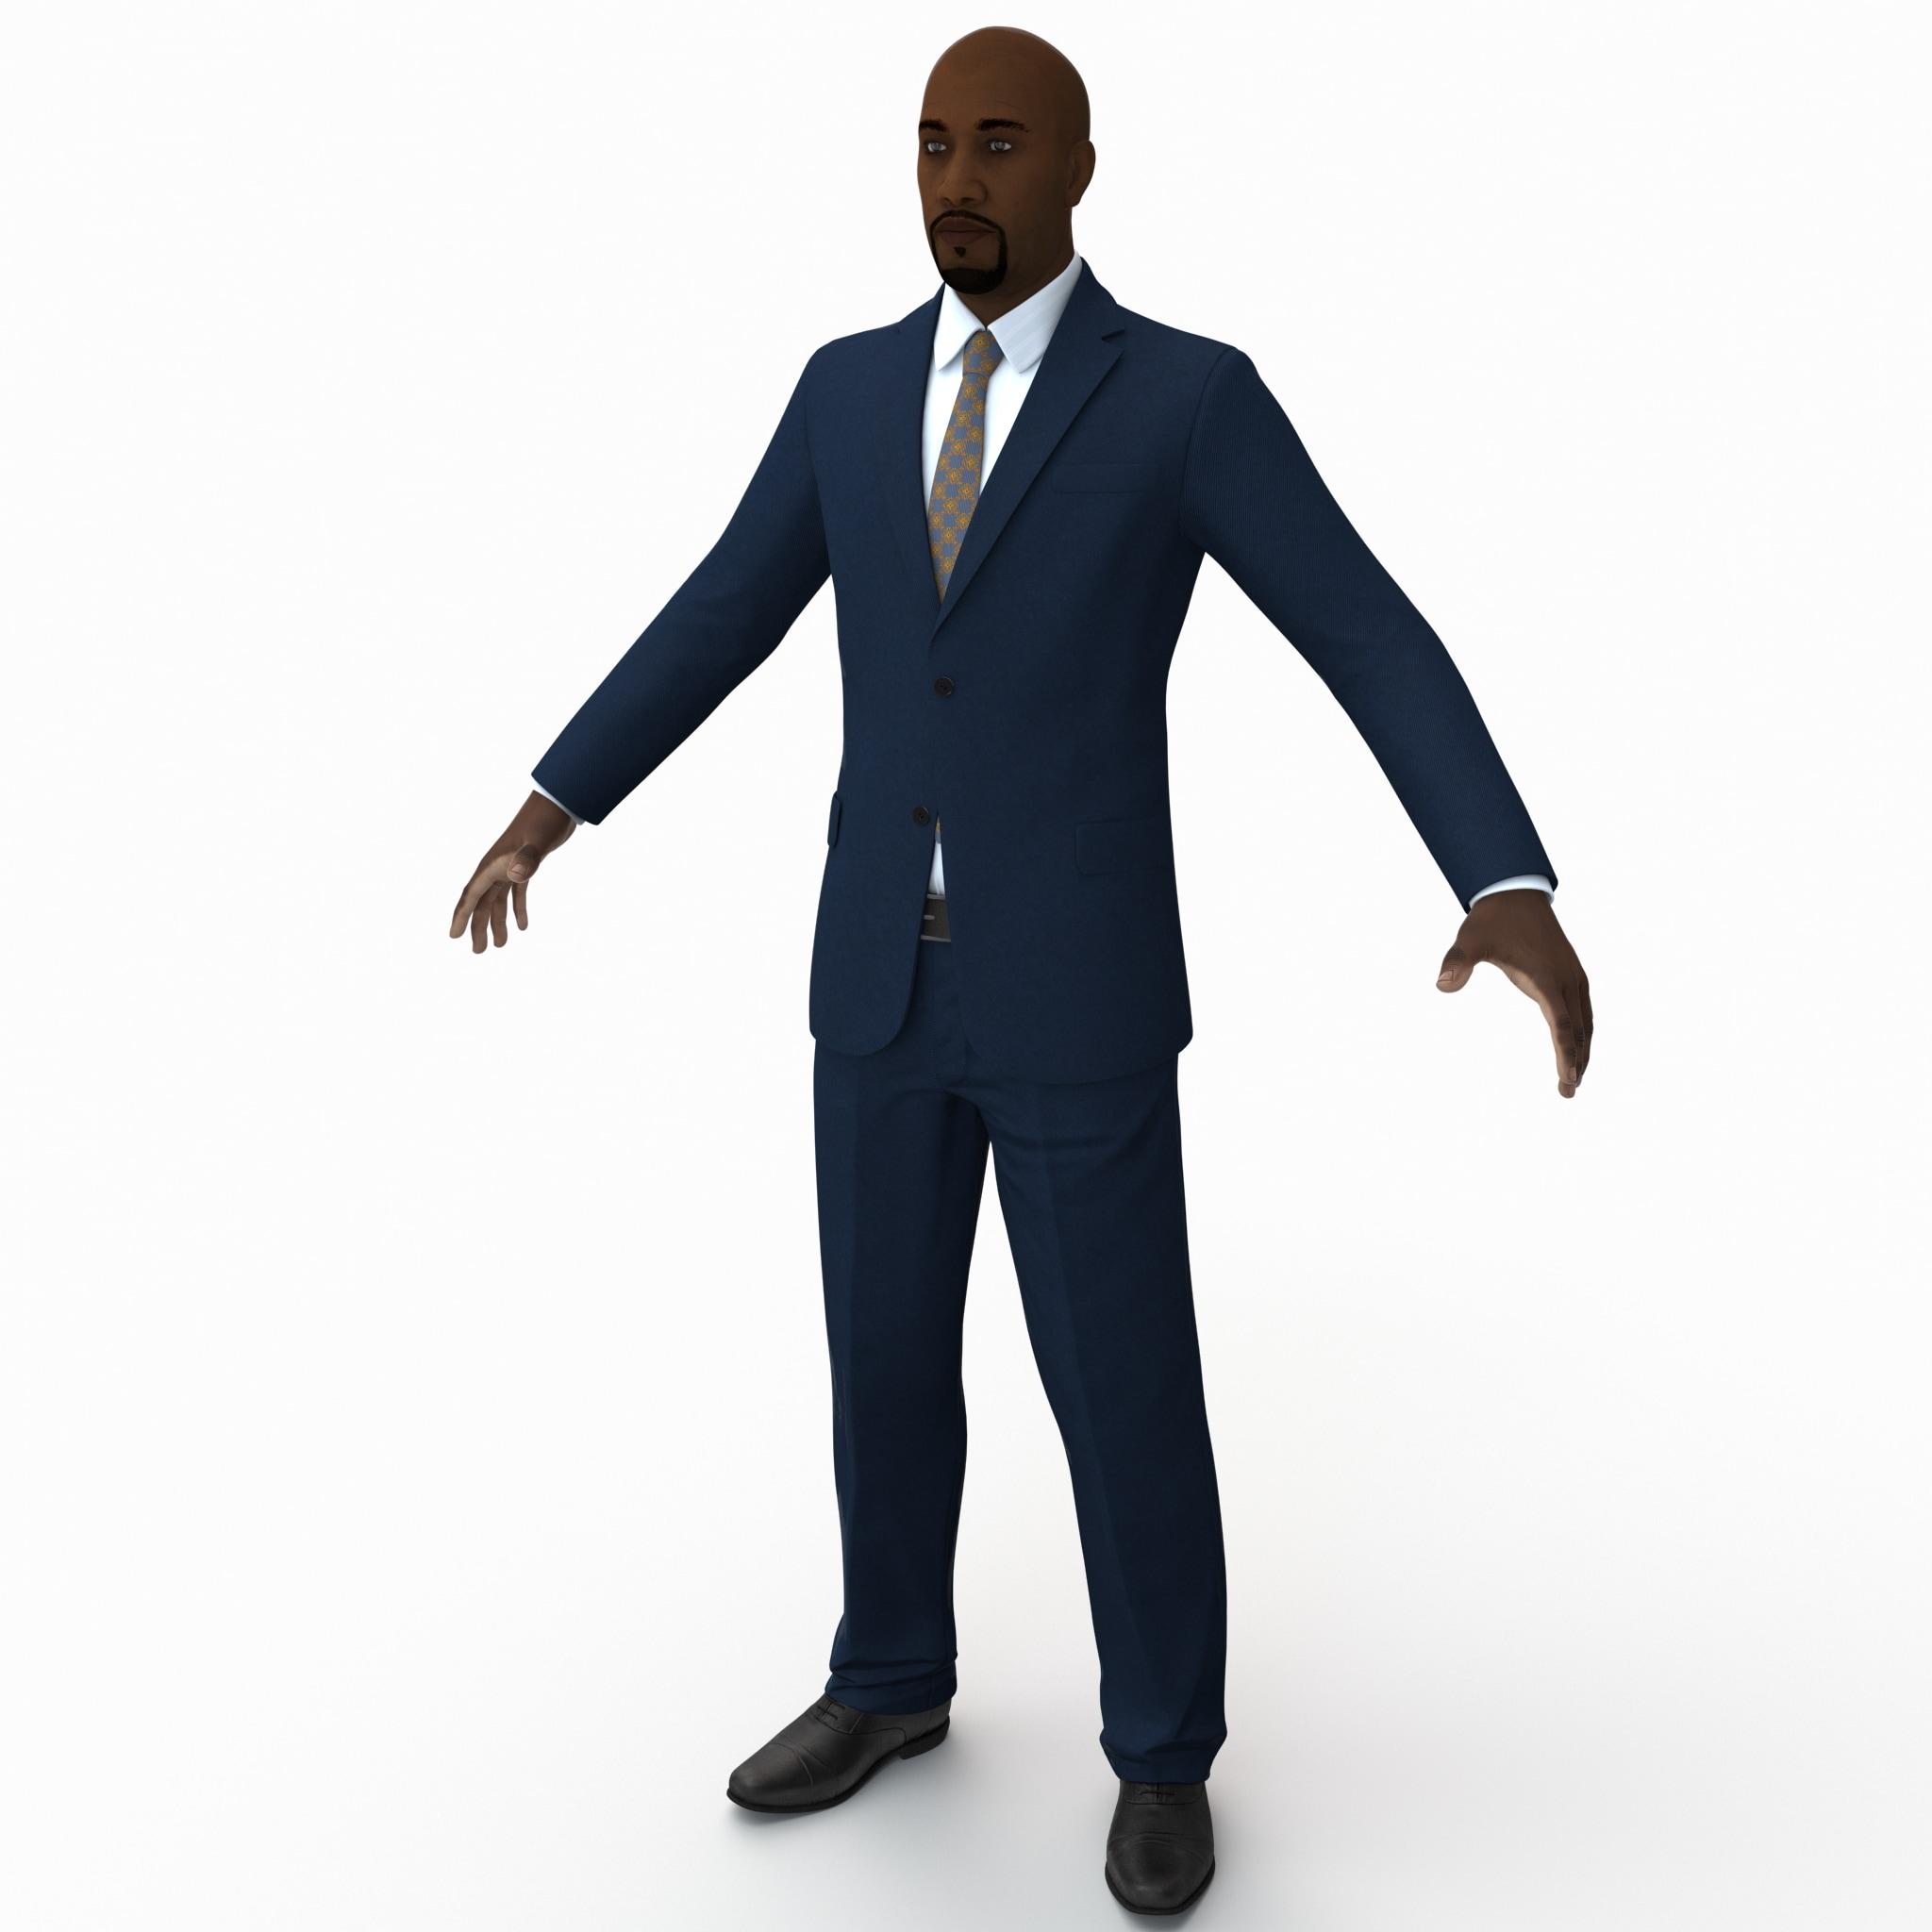 Black Male Businessman Rigged_2.jpg